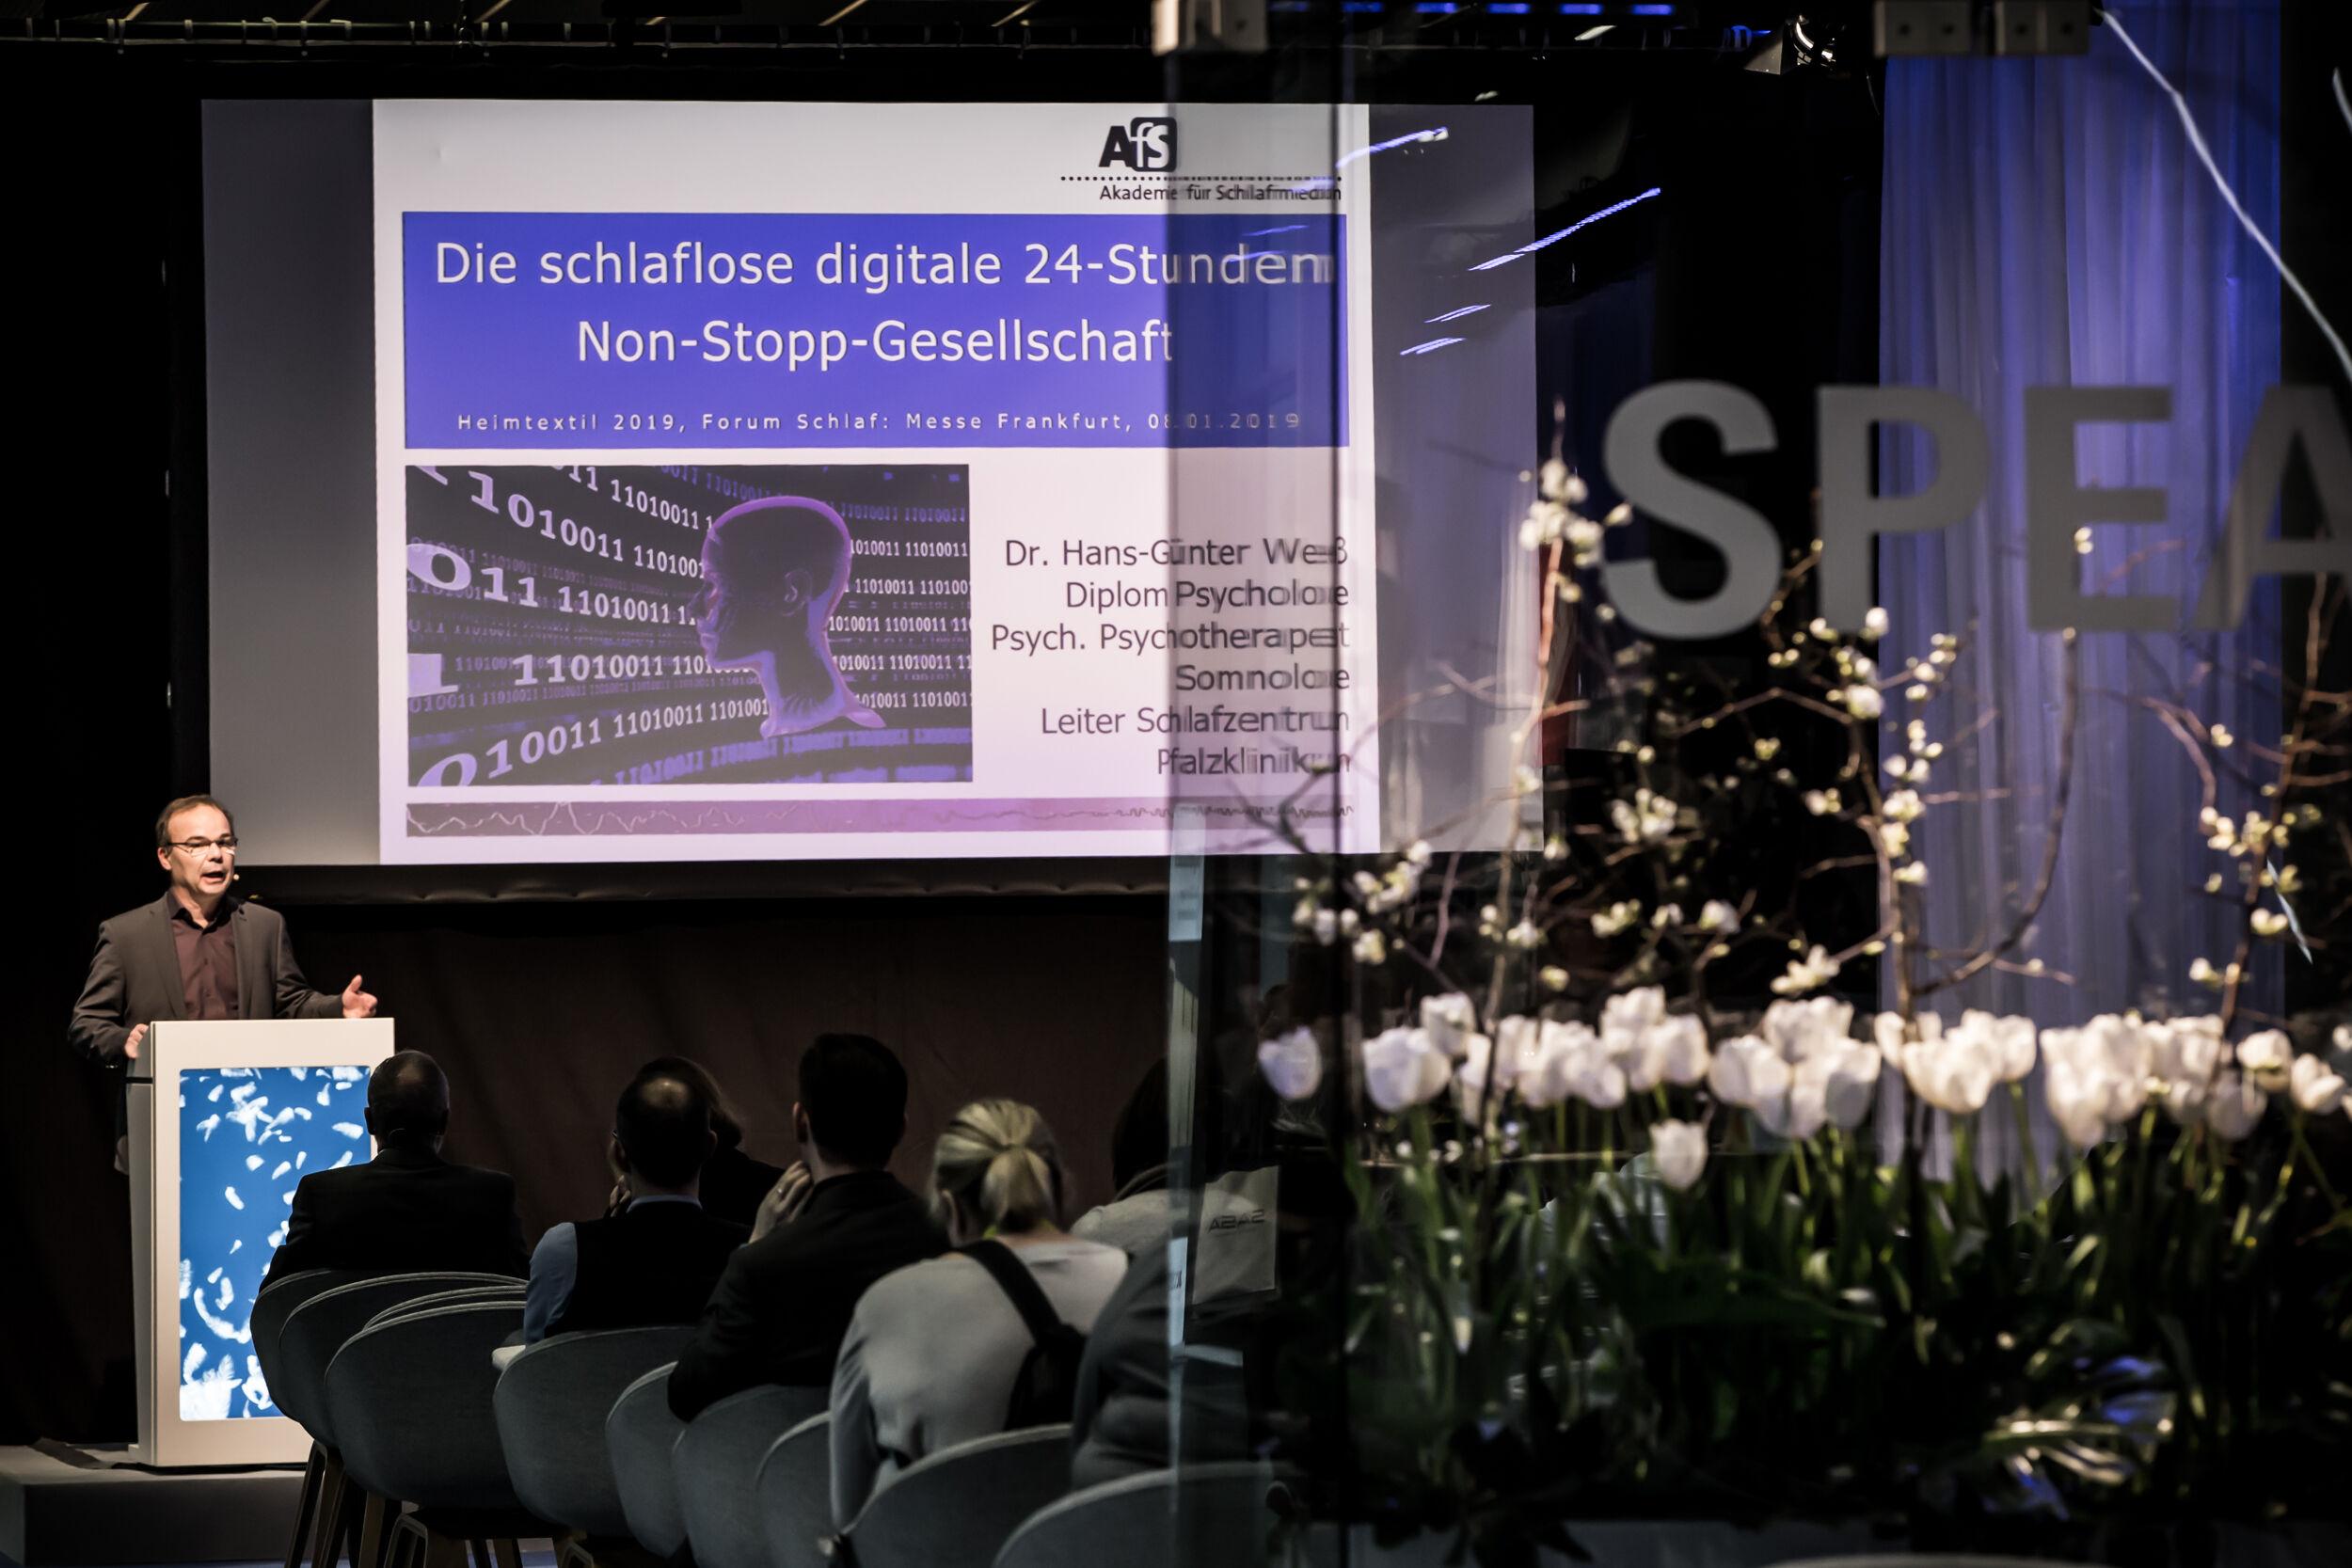 Heimtextil Messe |Frankfurt | 2019